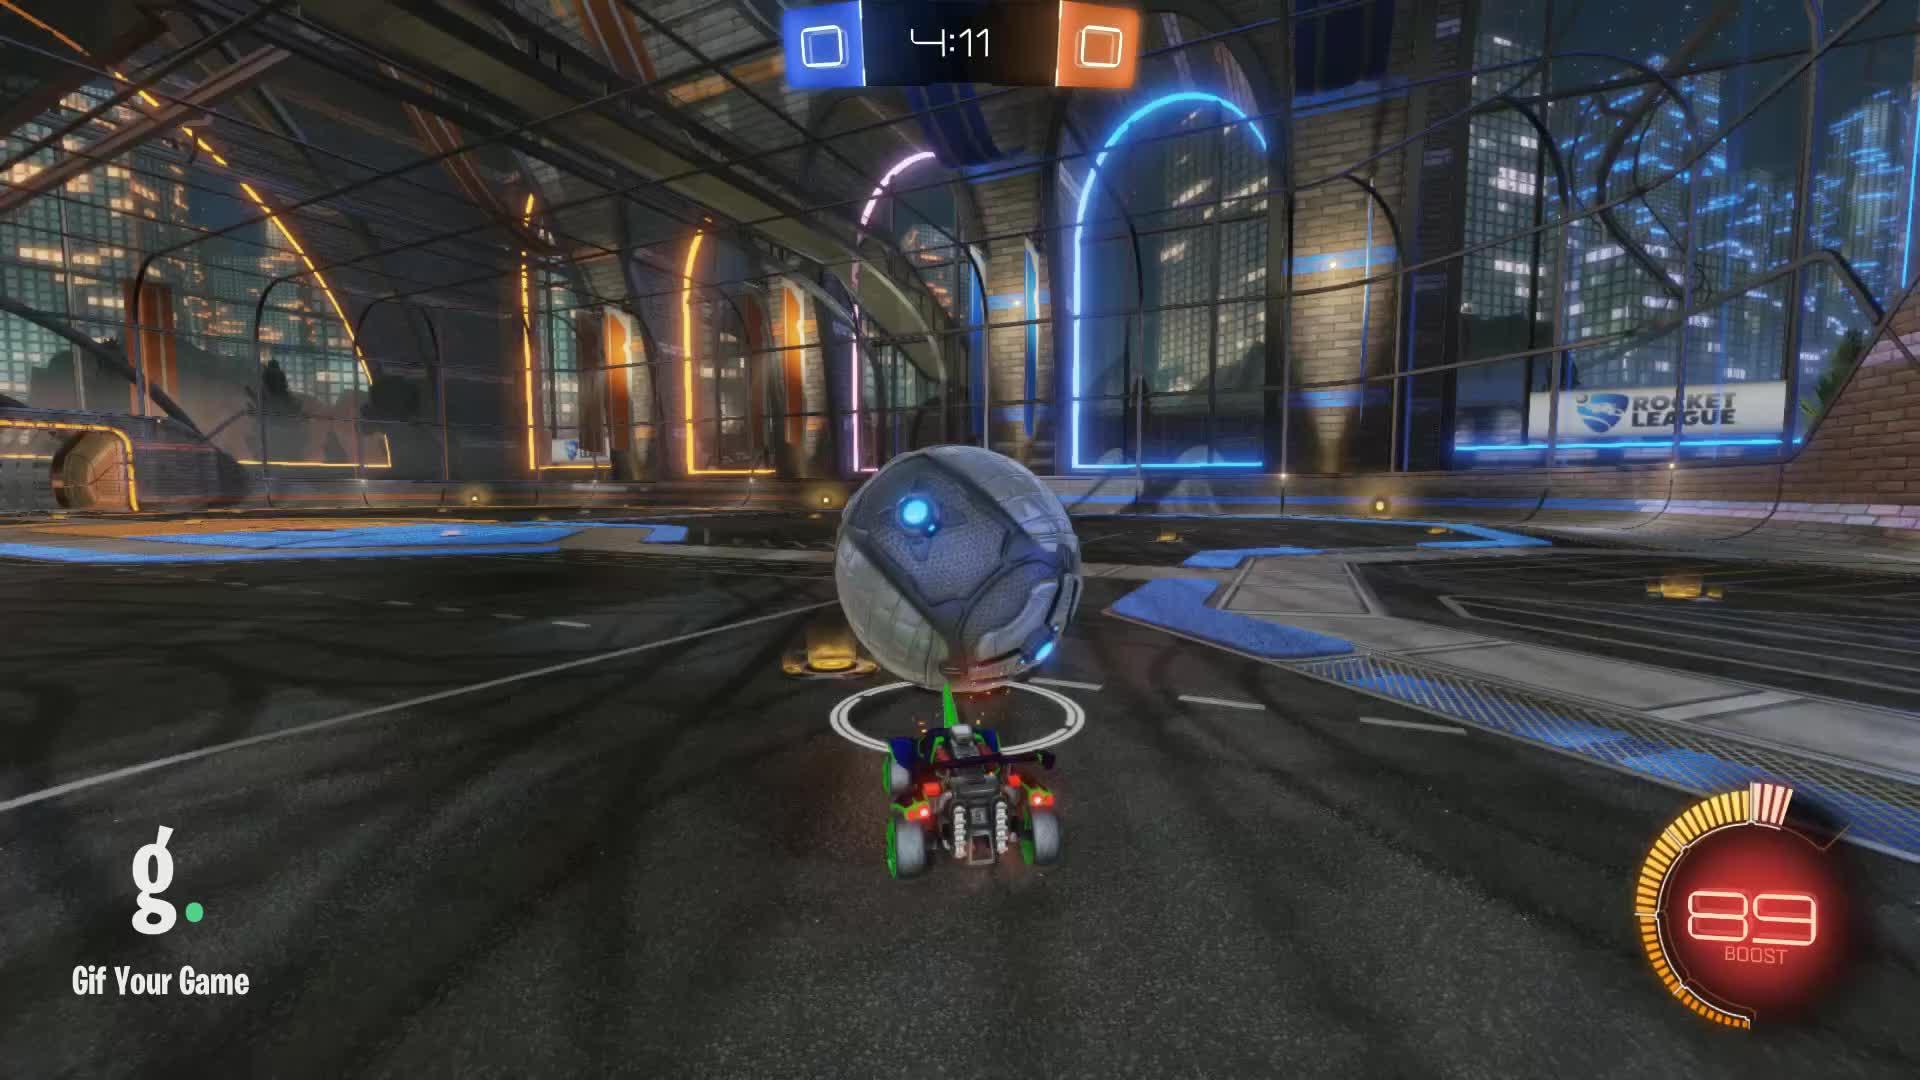 Gif Your Game, GifYourGame, Goal, Rocket League, RocketLeague, sinz, Goal 1: sinz GIFs